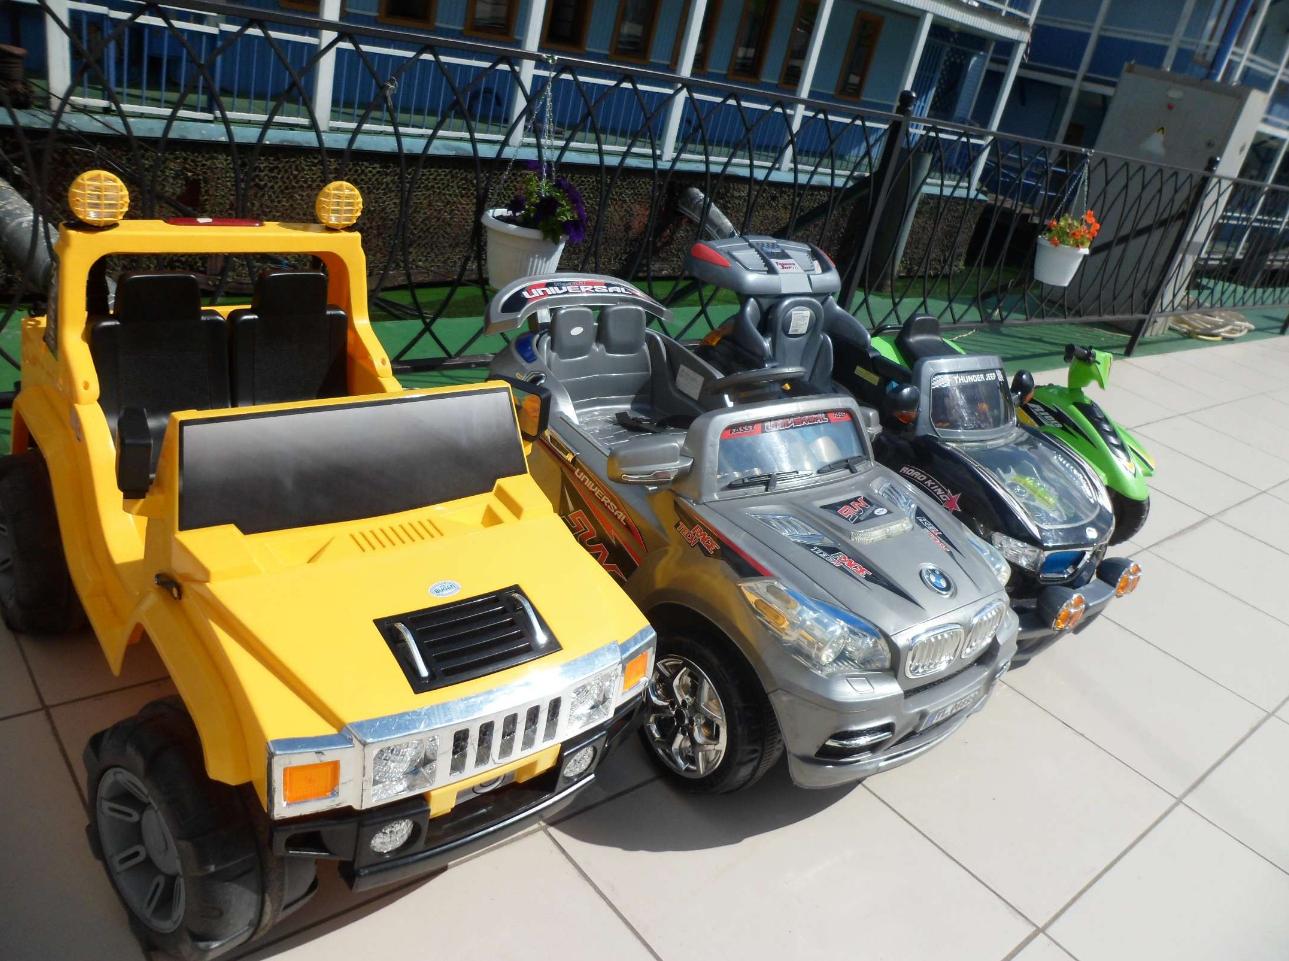 бизнес-идея организации проката электромобилей